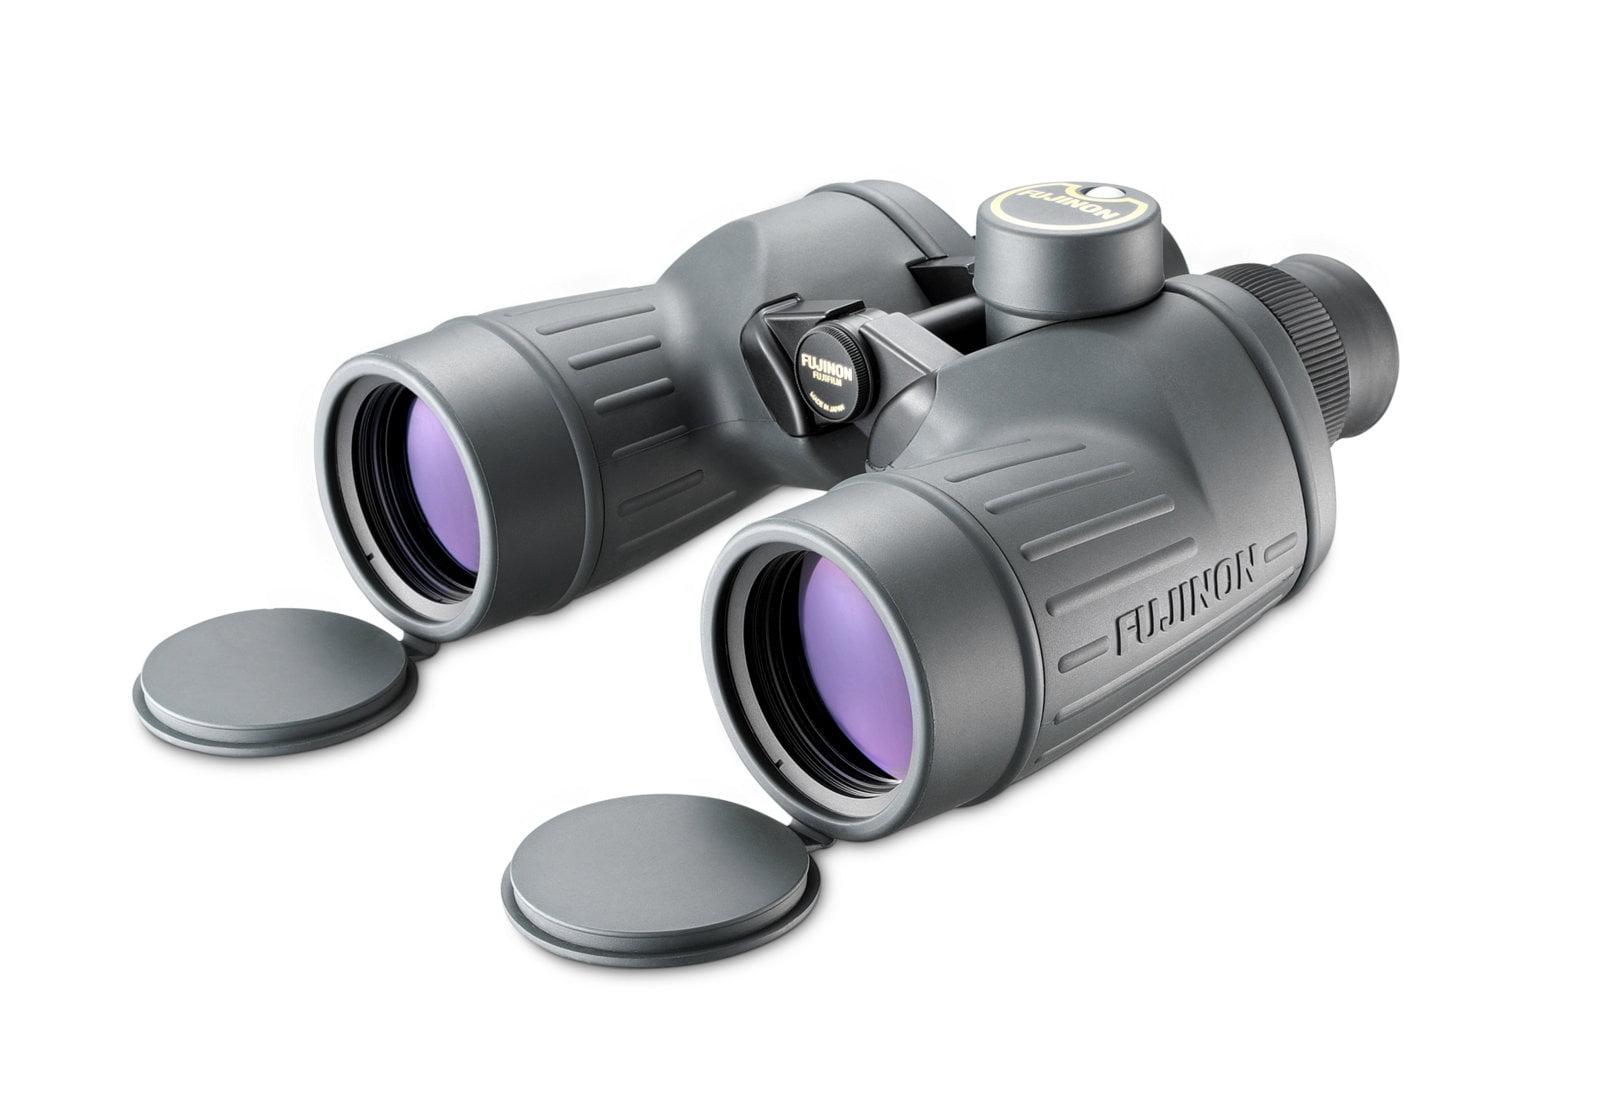 Fujinon Polaris 7x50 FMTRC-SX Binocular by Fujifilm